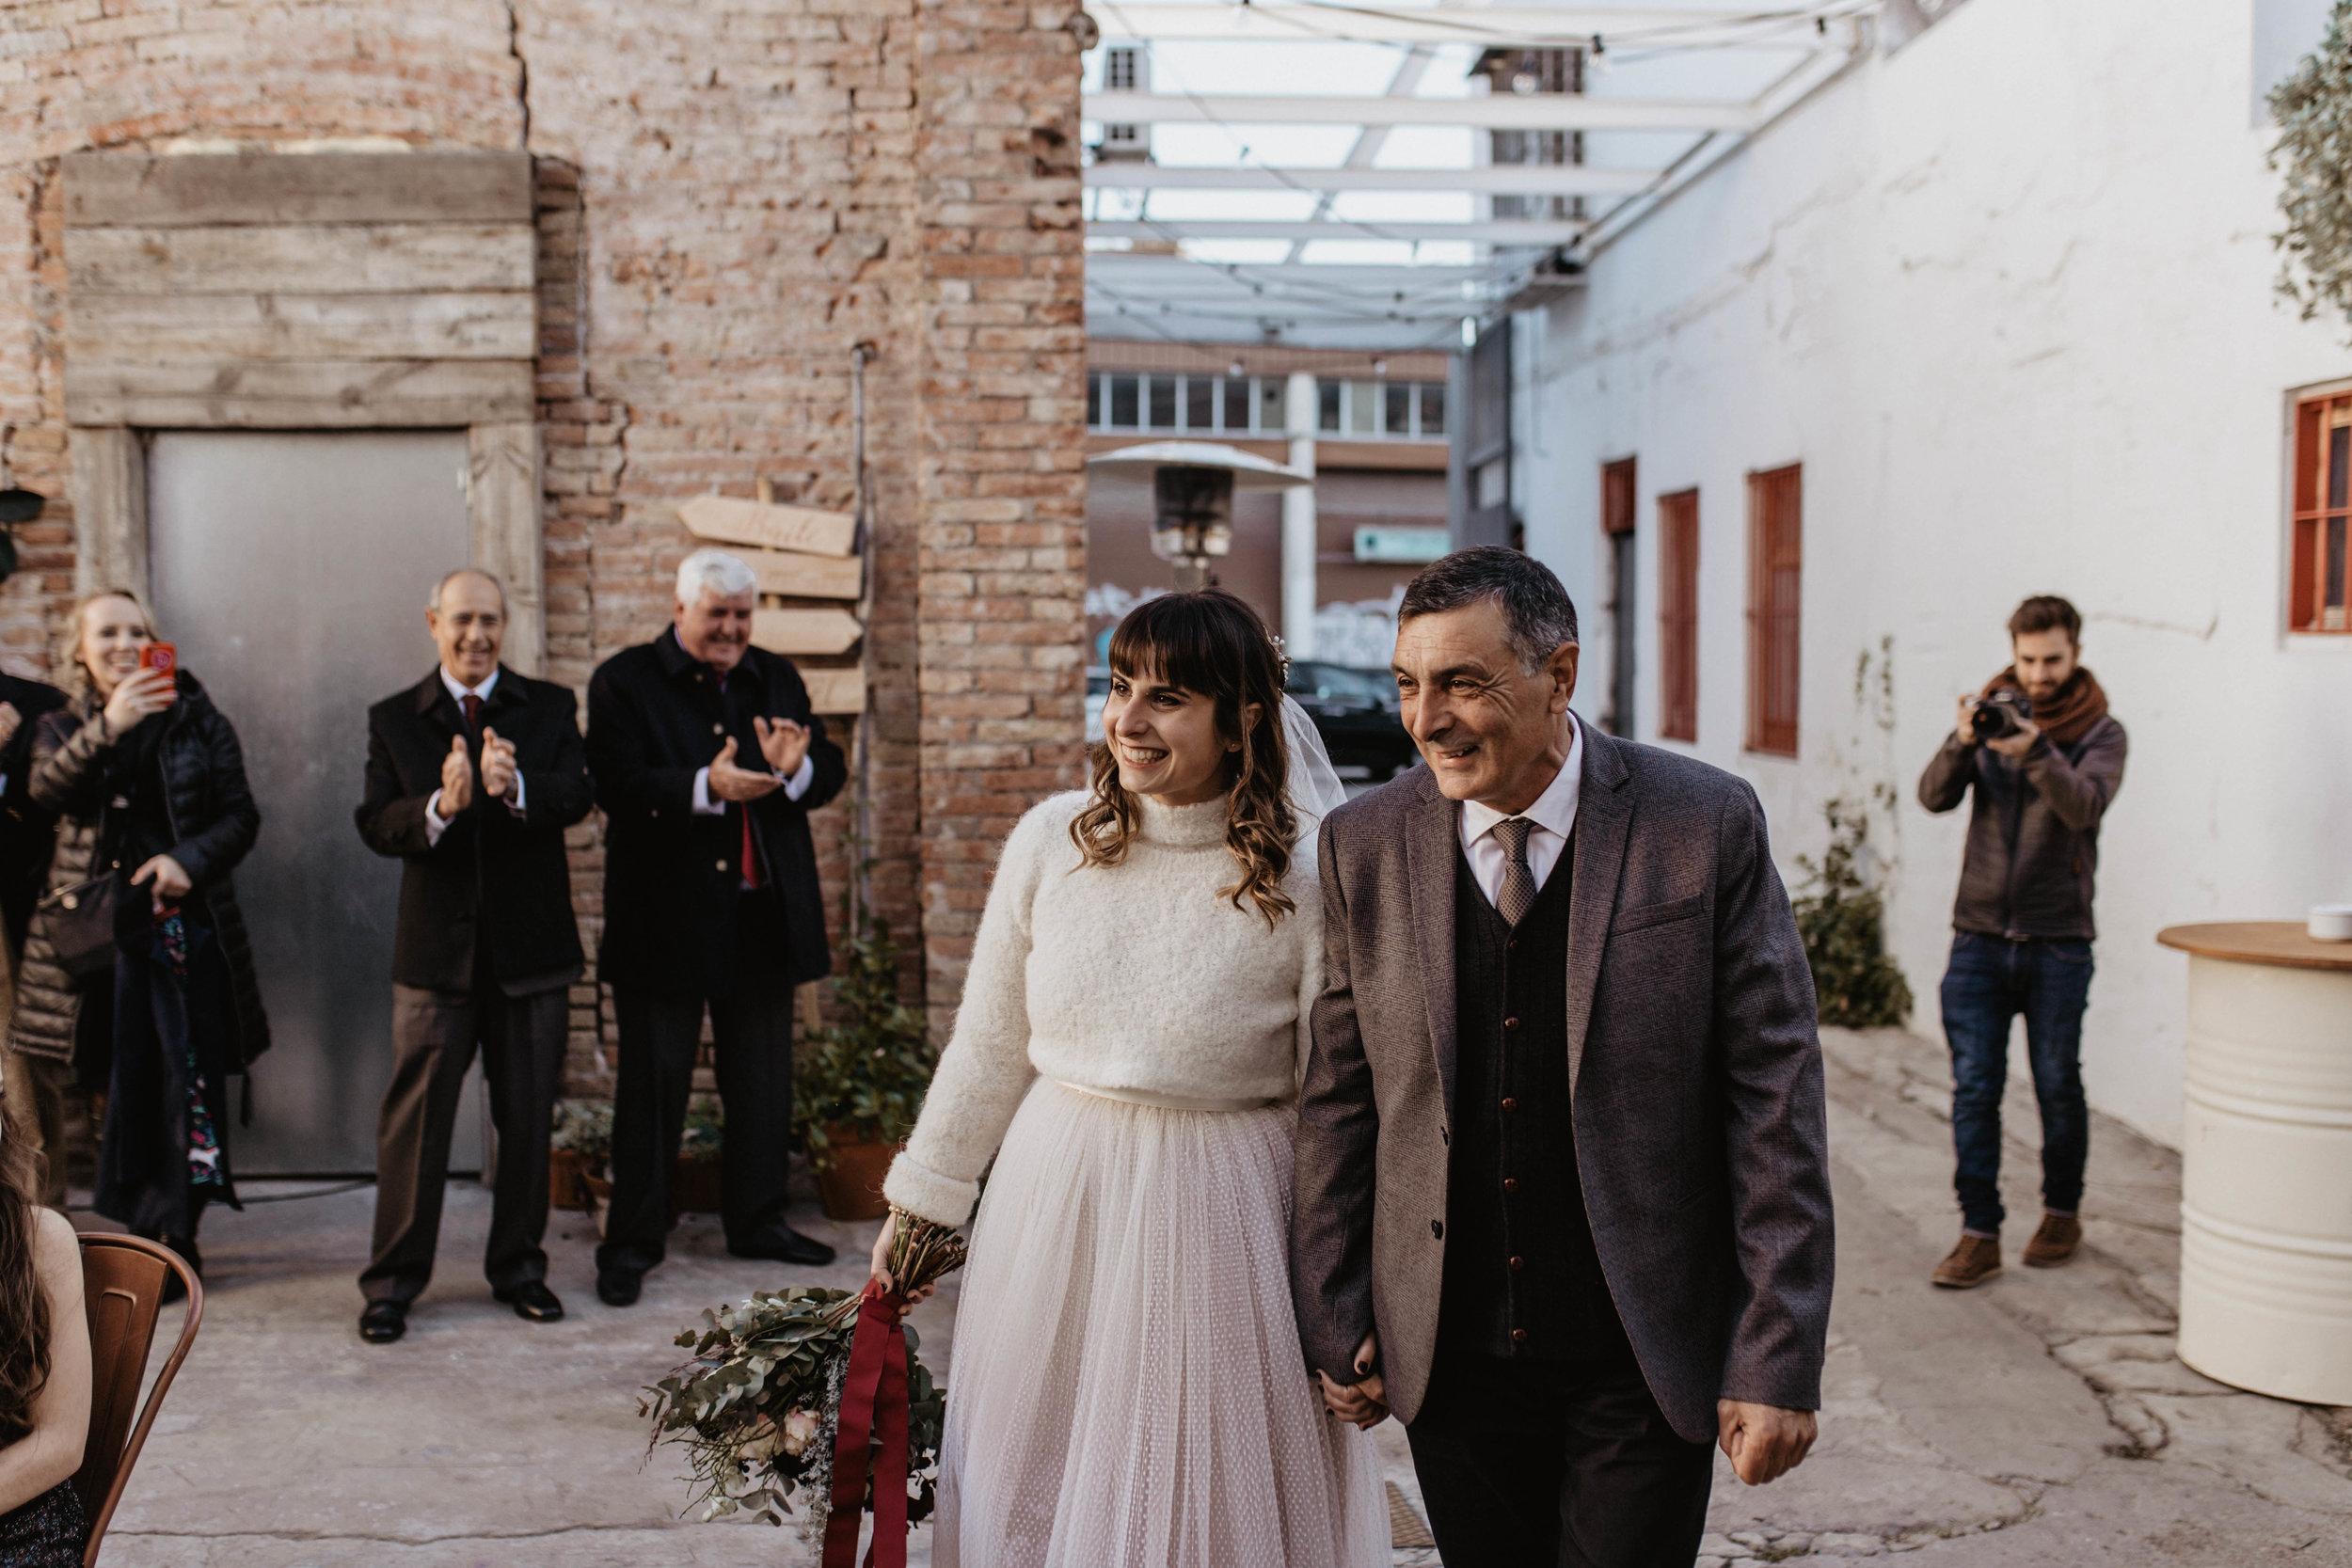 thenortherngirlphotography-photography-weddingphotography-couple-bodasconestilo-bodasenbarcelona-martadavid-553.jpg